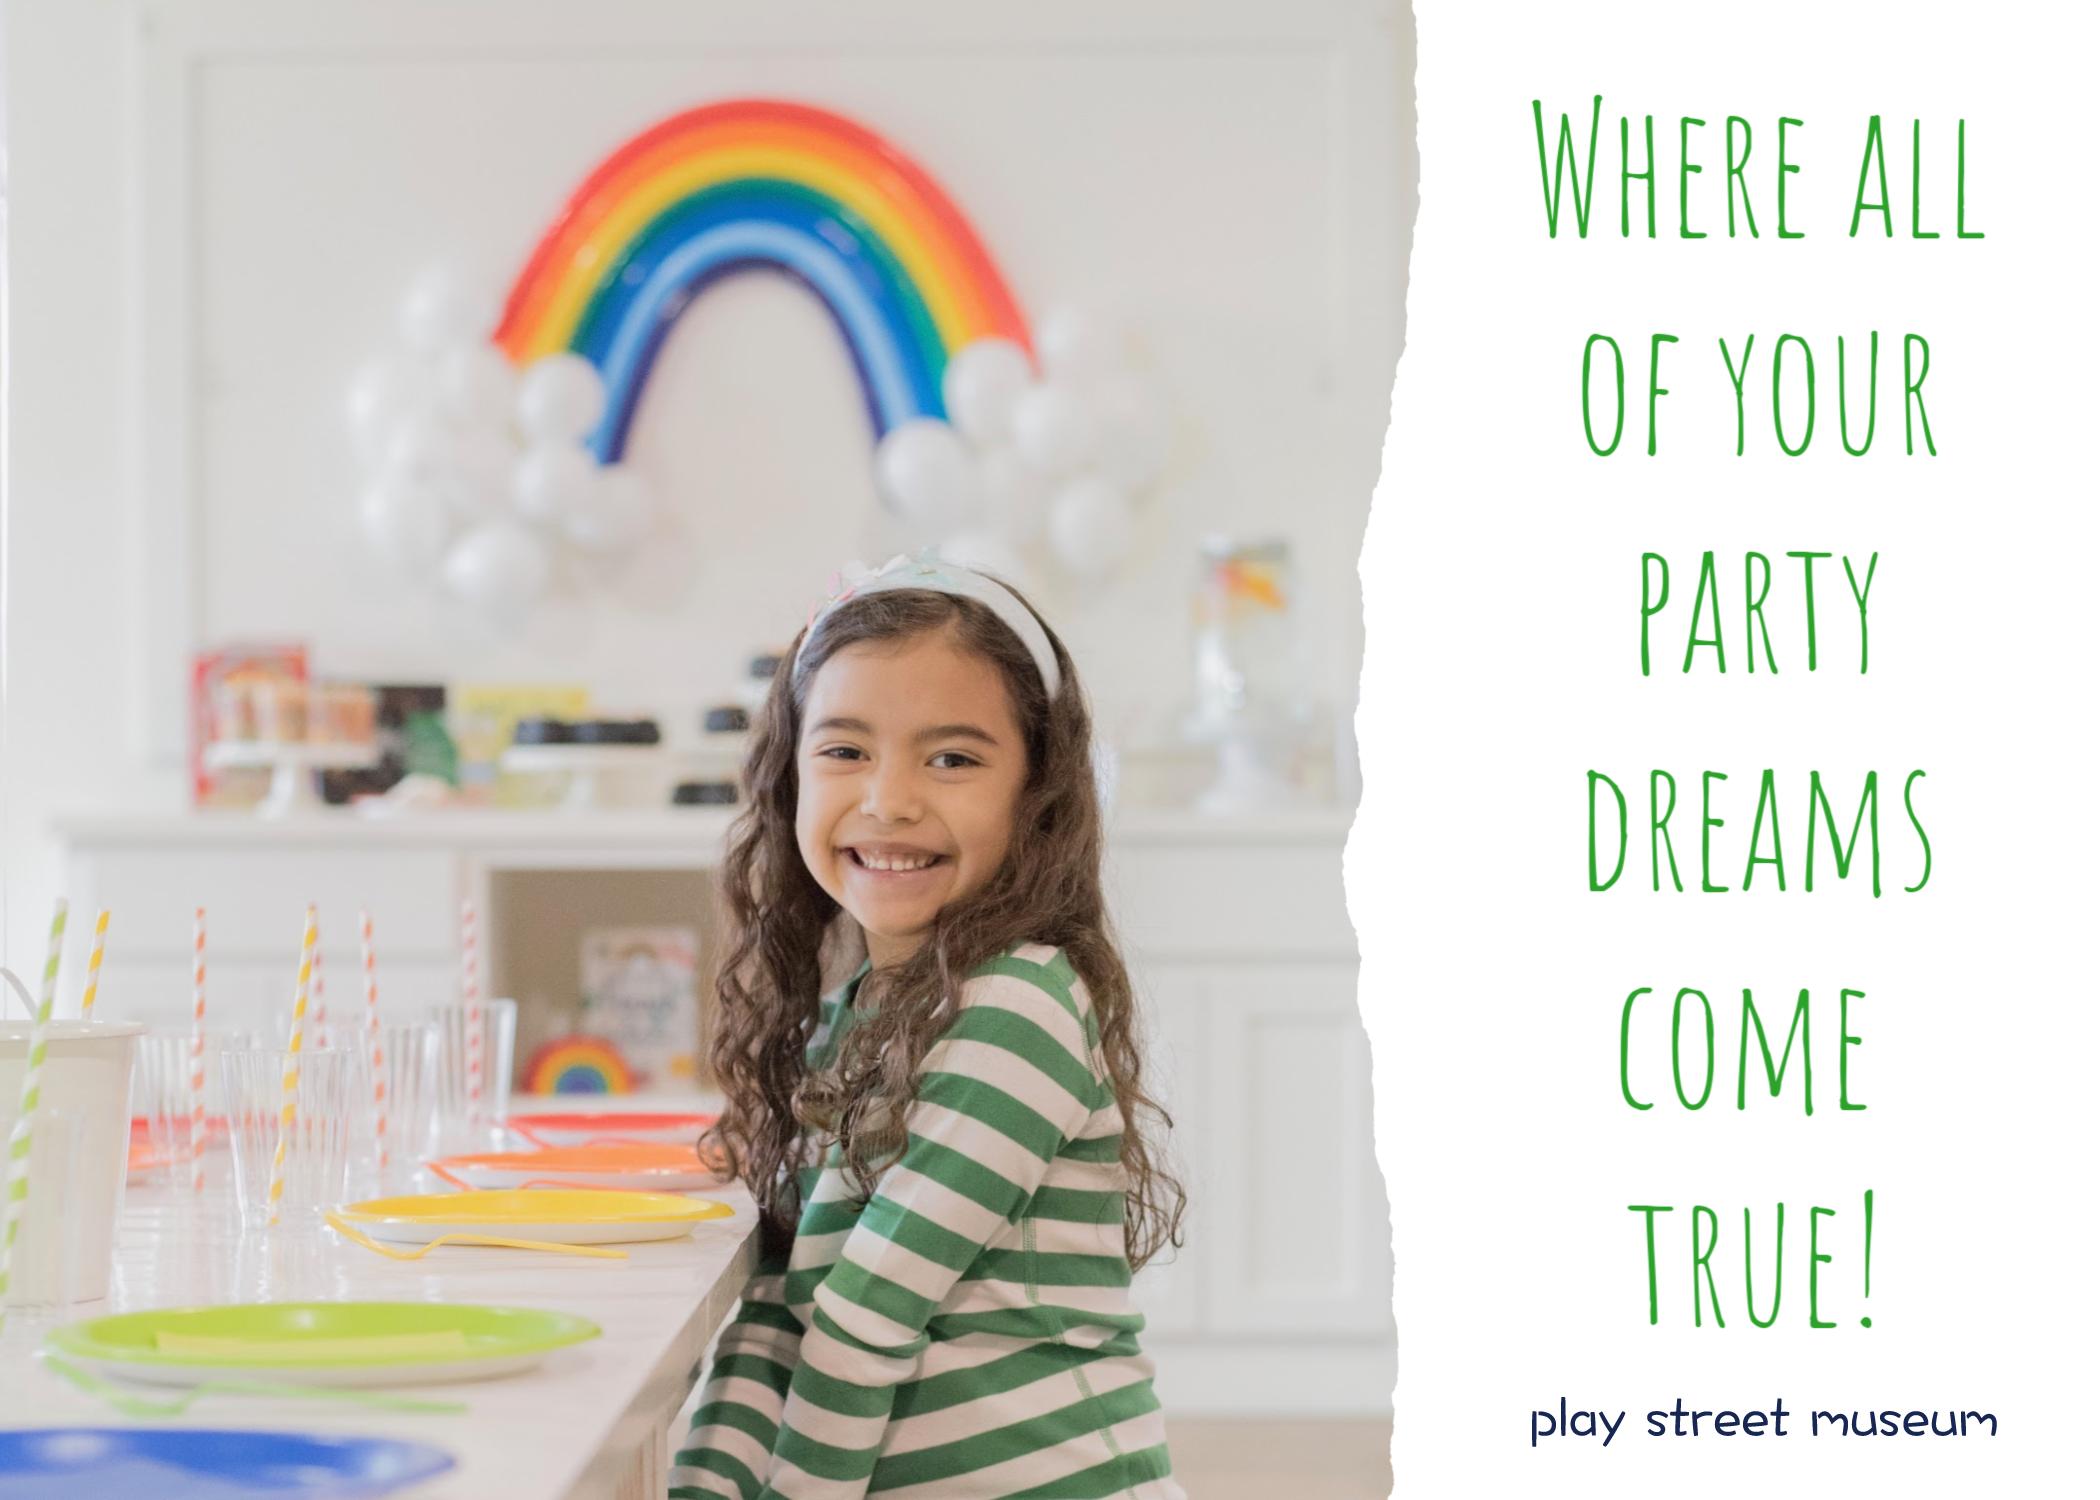 Dreams Come True Party Ad.png